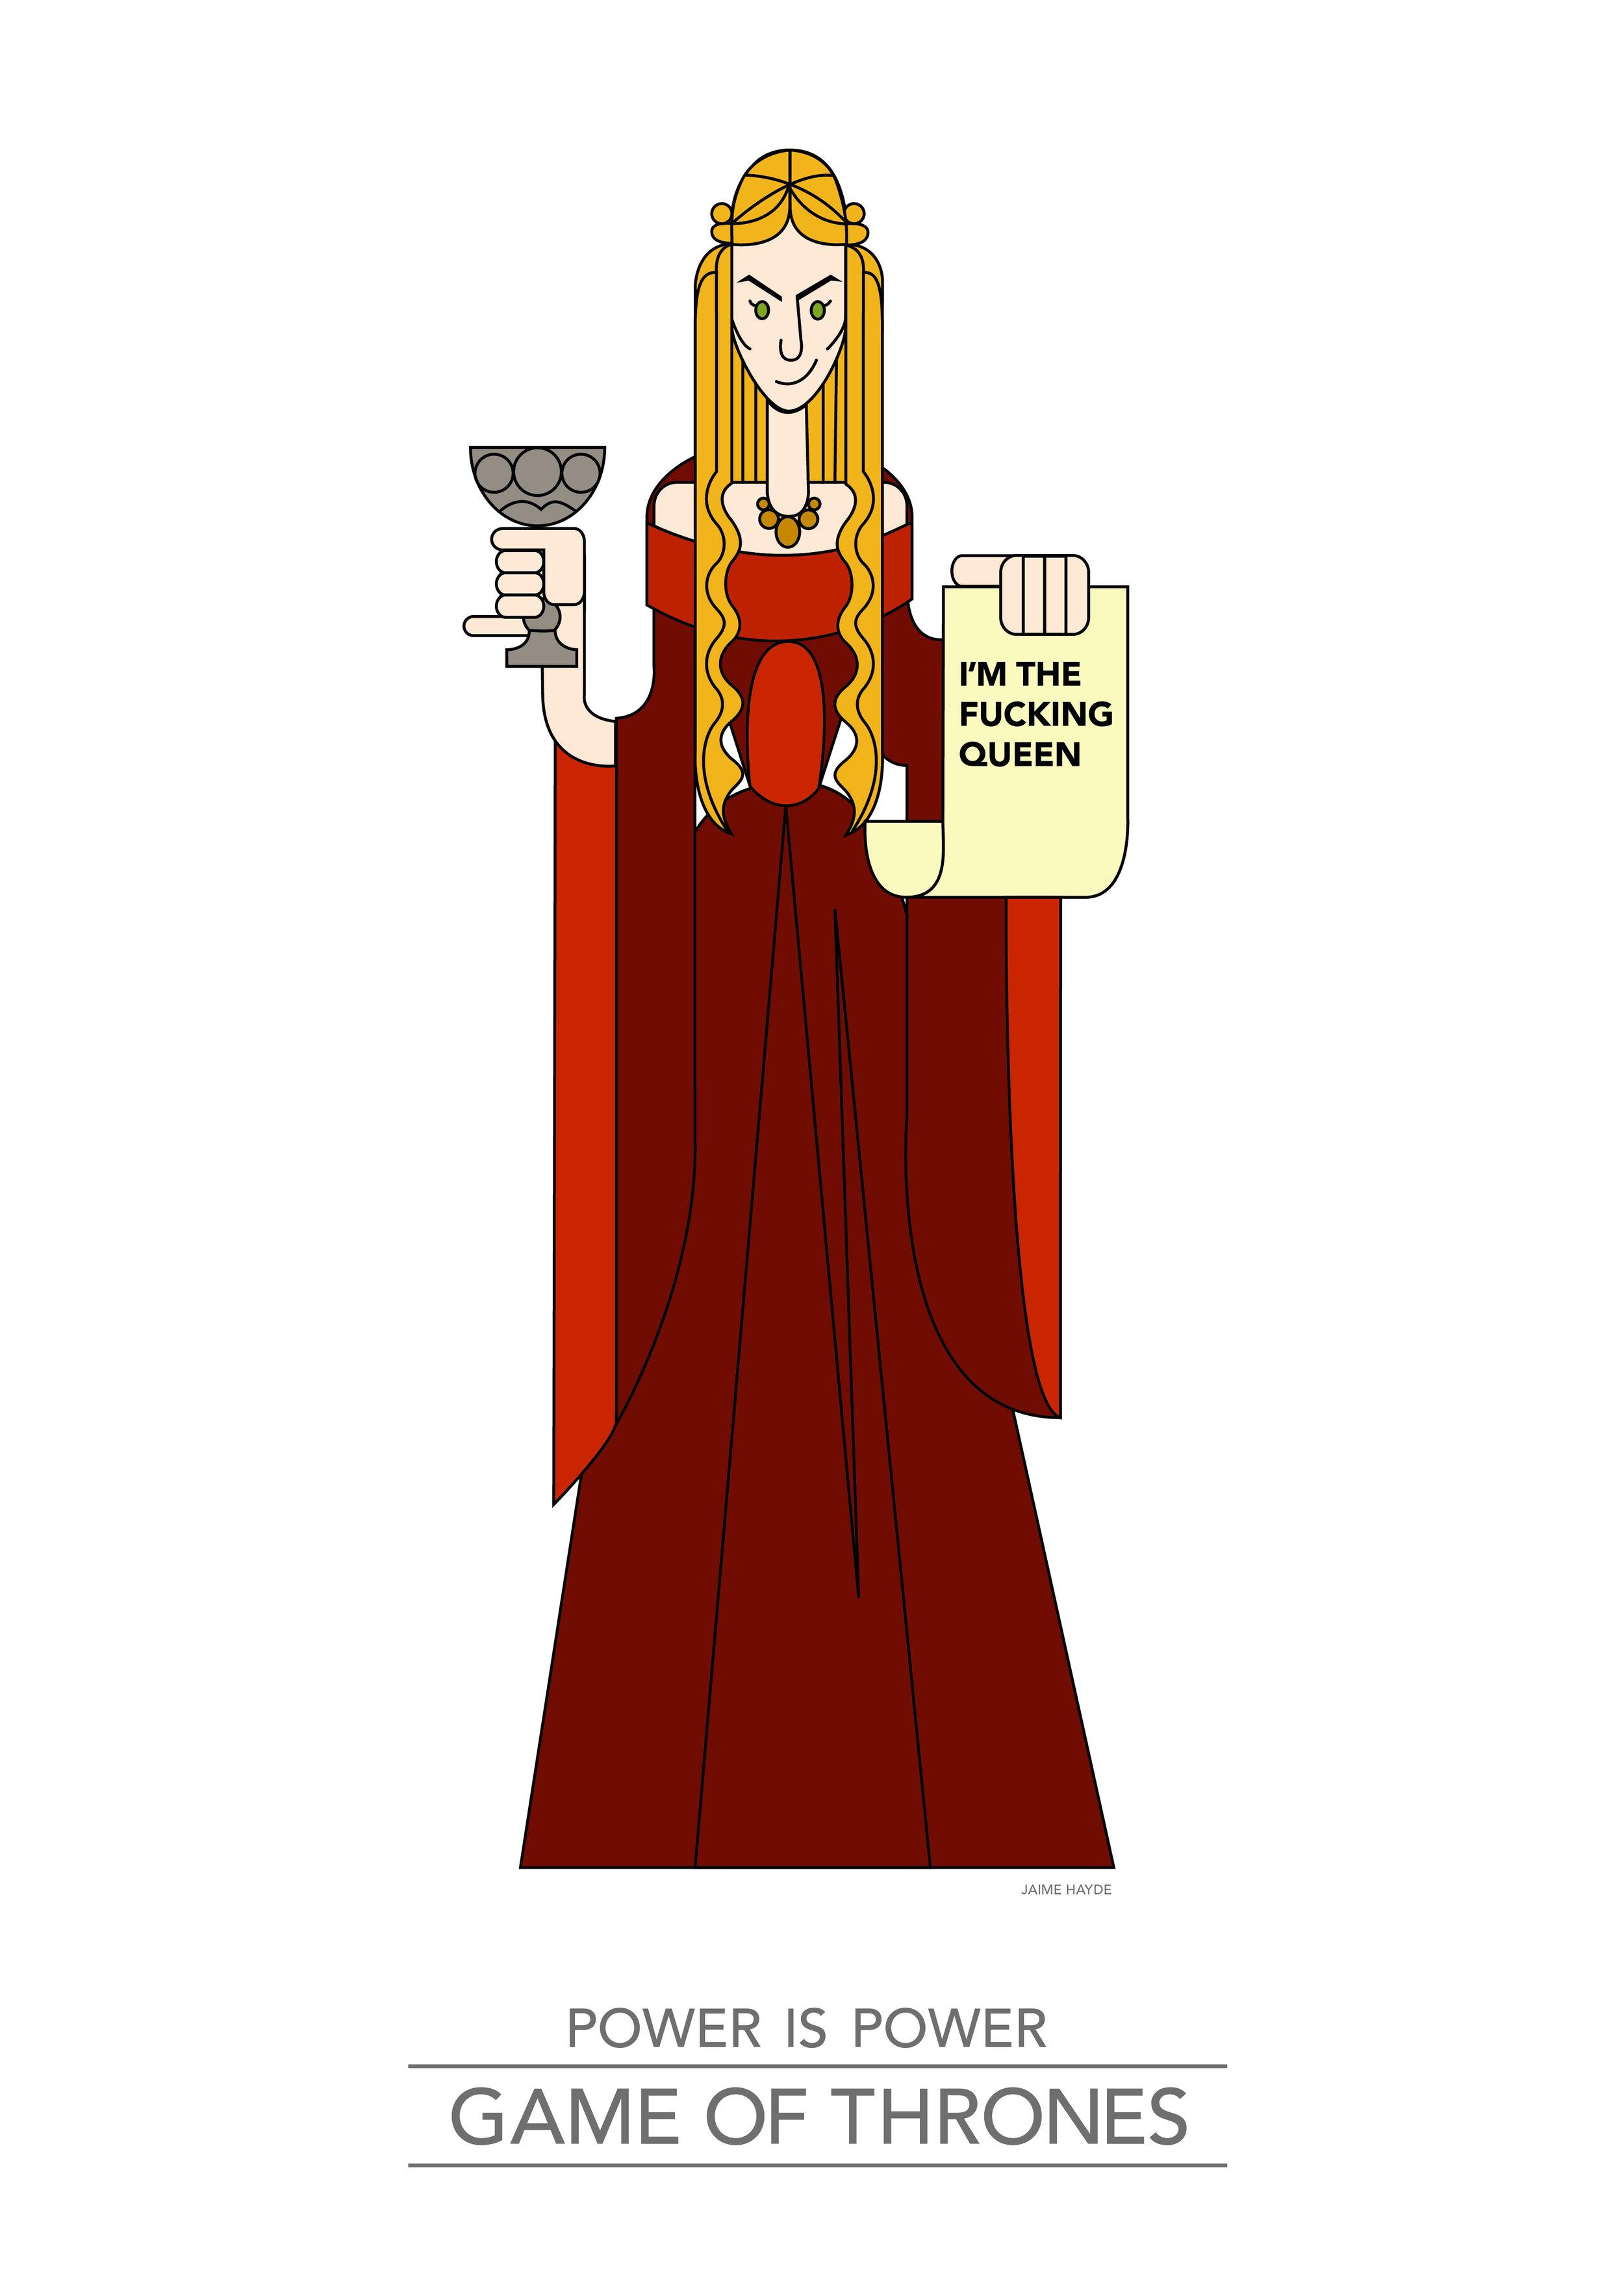 Game-of-thrones-Juego-de-tronos-Cersei.jpg